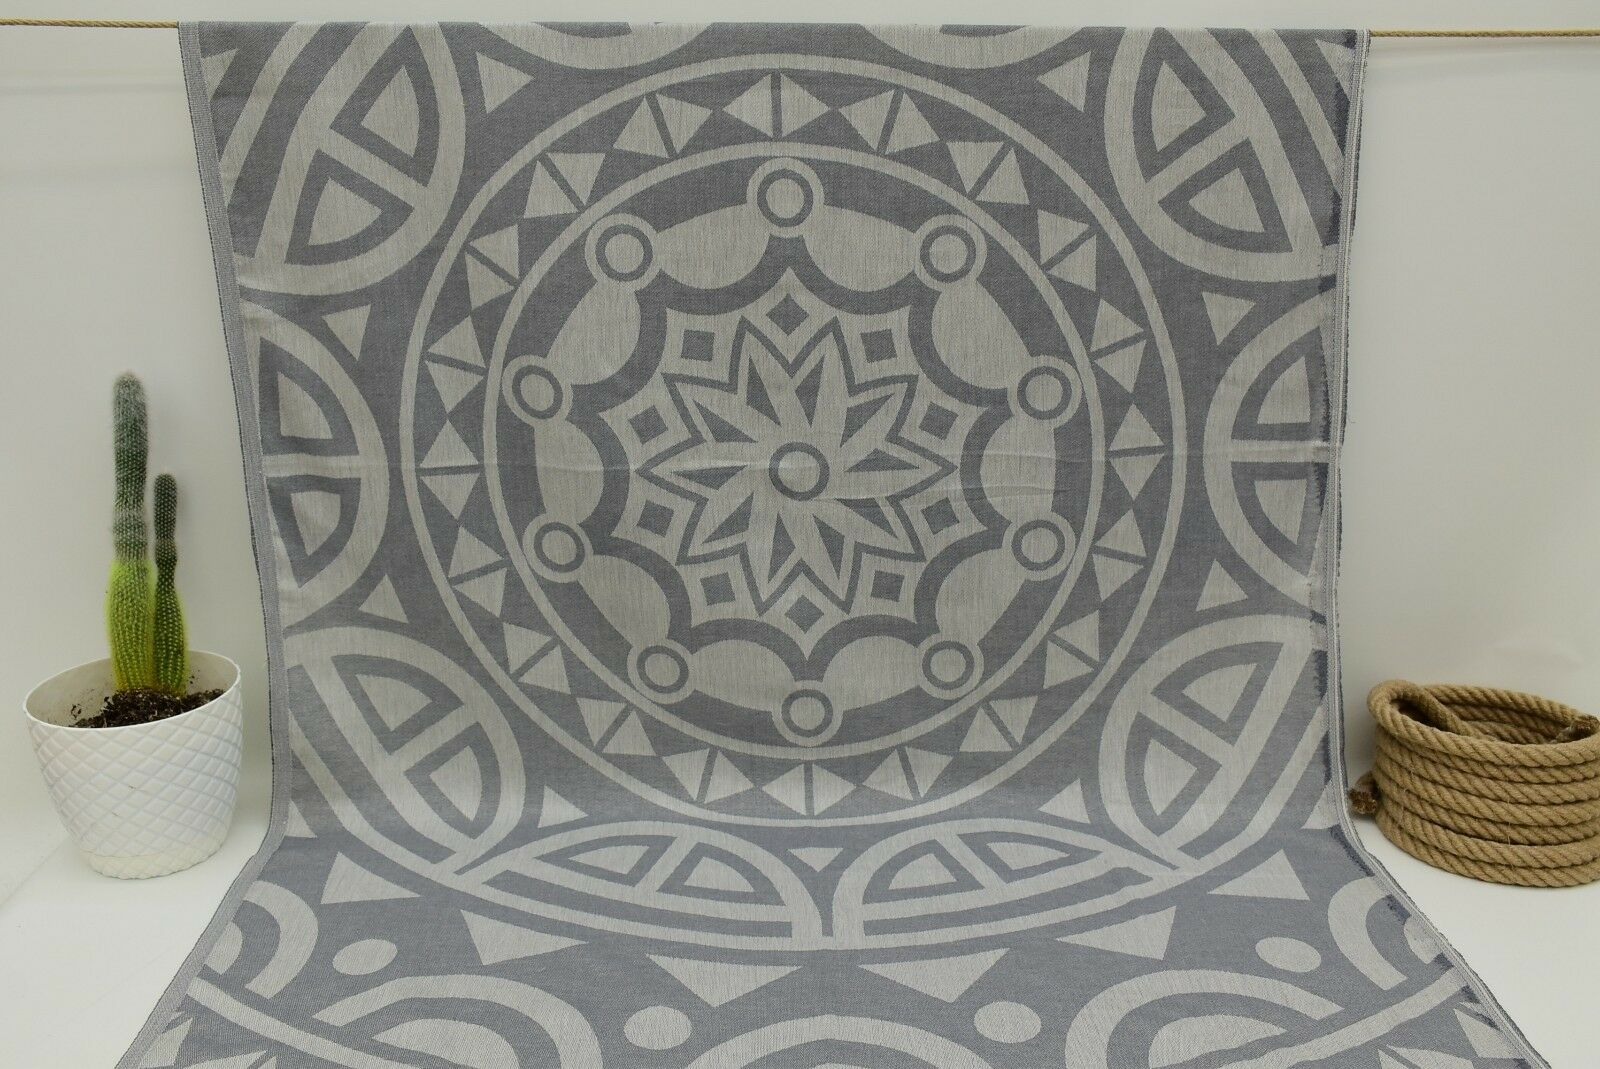 SPECIAL TOWEL Art Towel Peshtemal Towel Organic Cotton Towel Geometric Brc-Mtm1